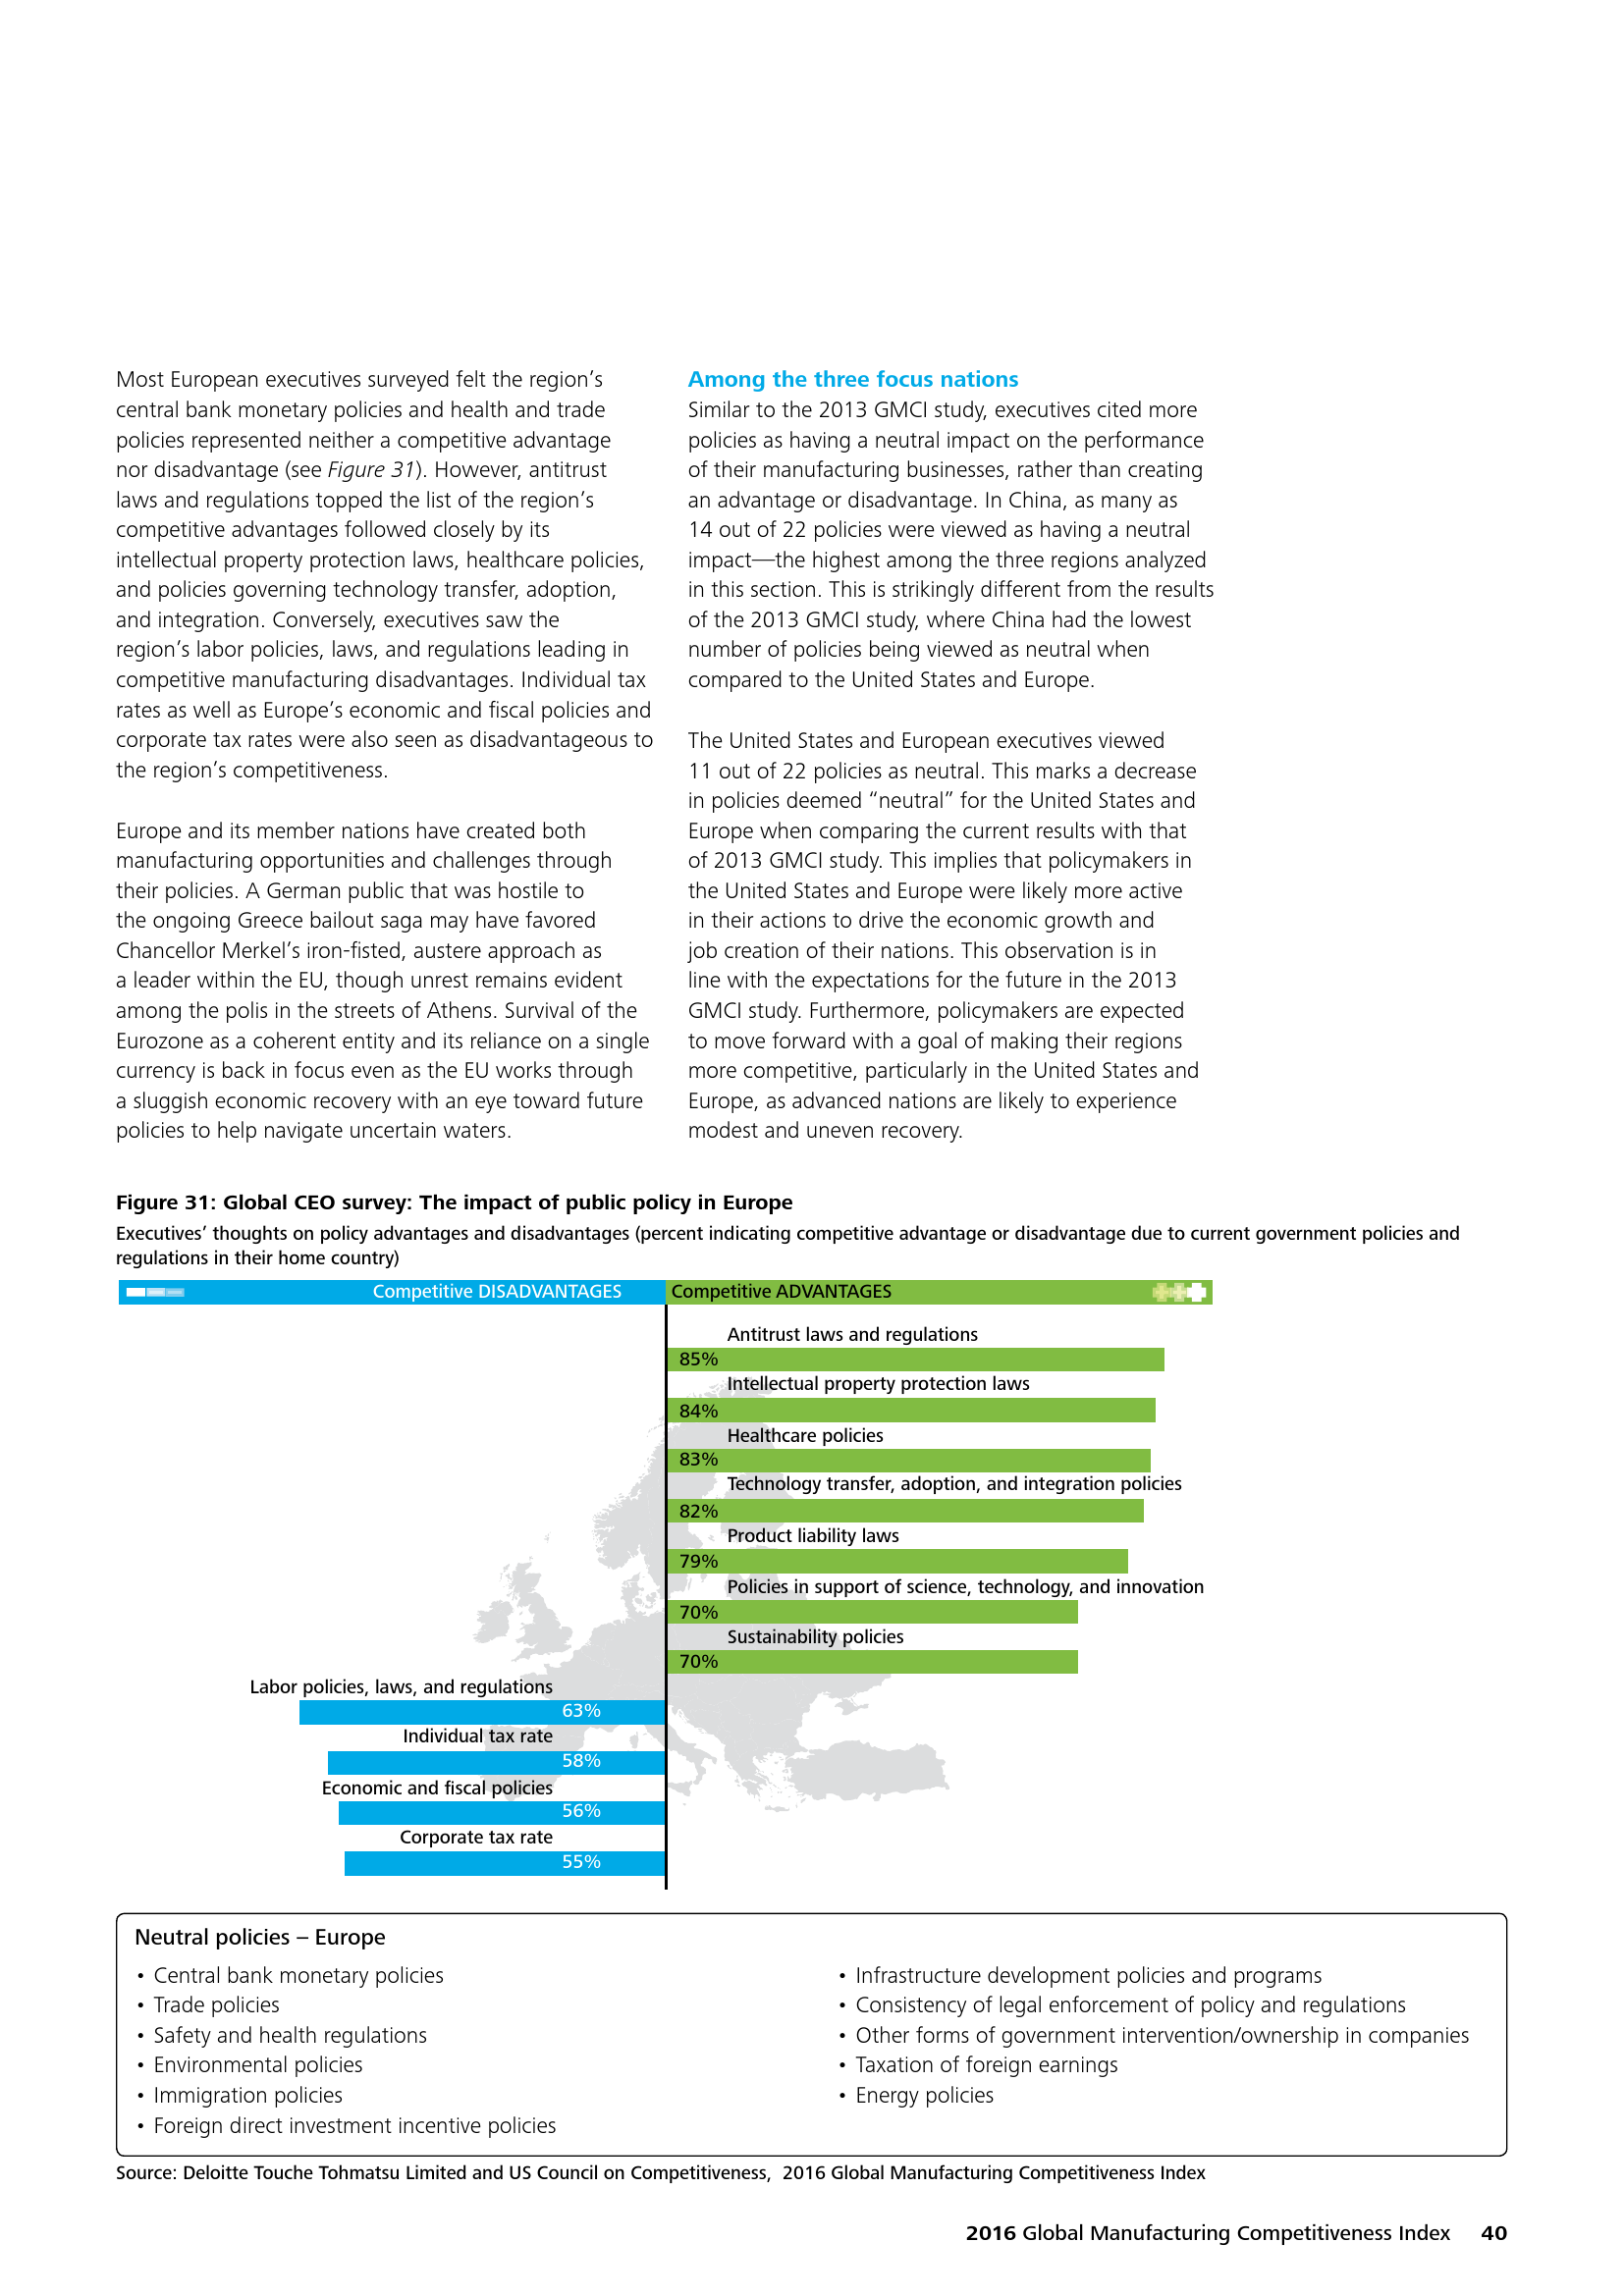 deloitte-cn-global-mfg-competitiveness-index-2016-en-160401_000043